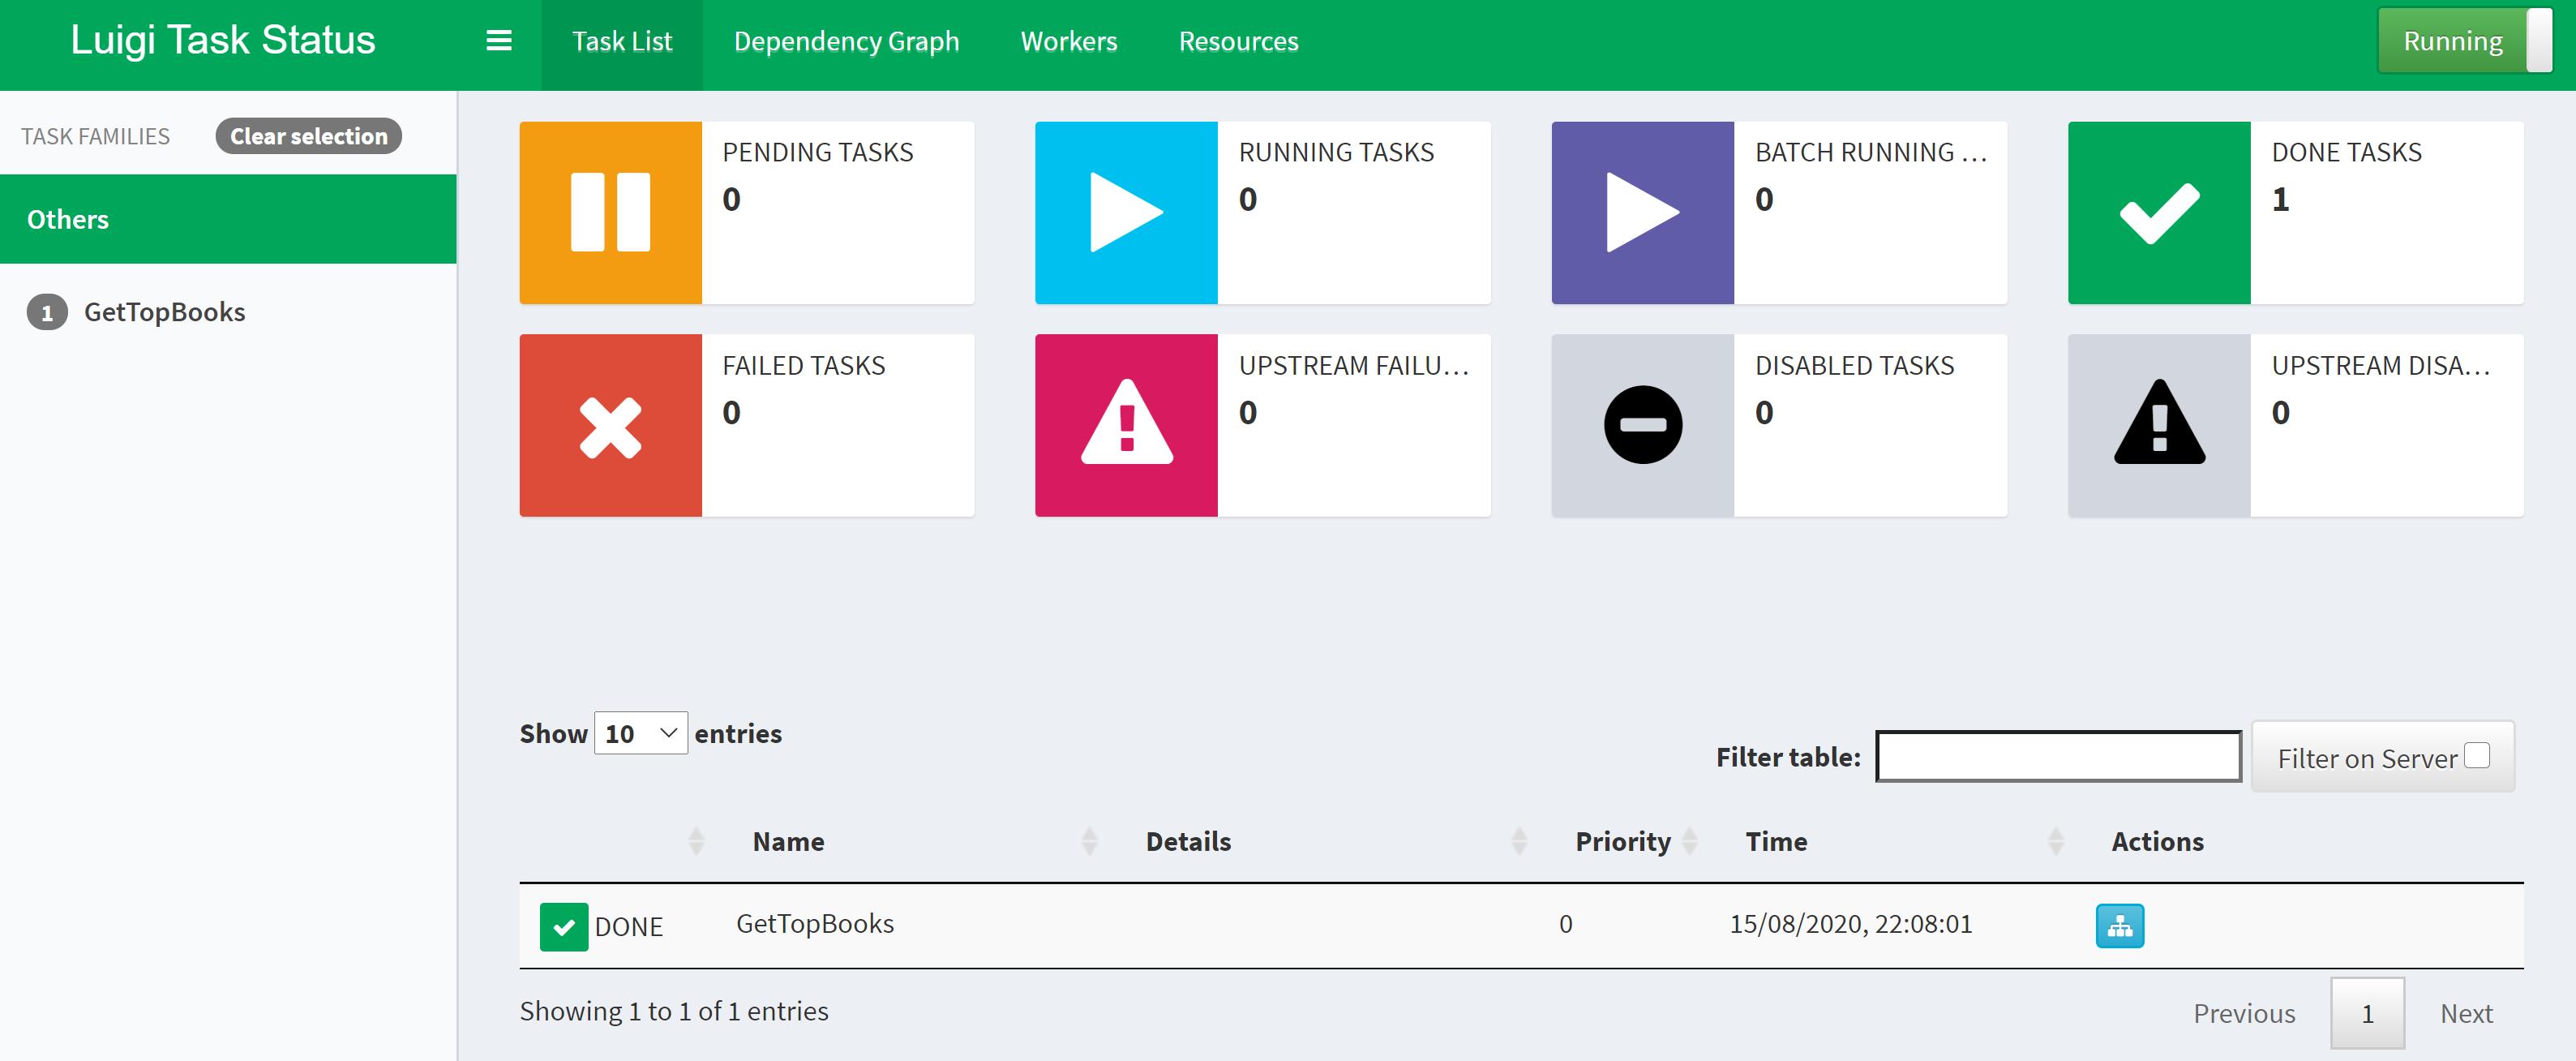 Luigi User Interface after running the GetTopBooks Task